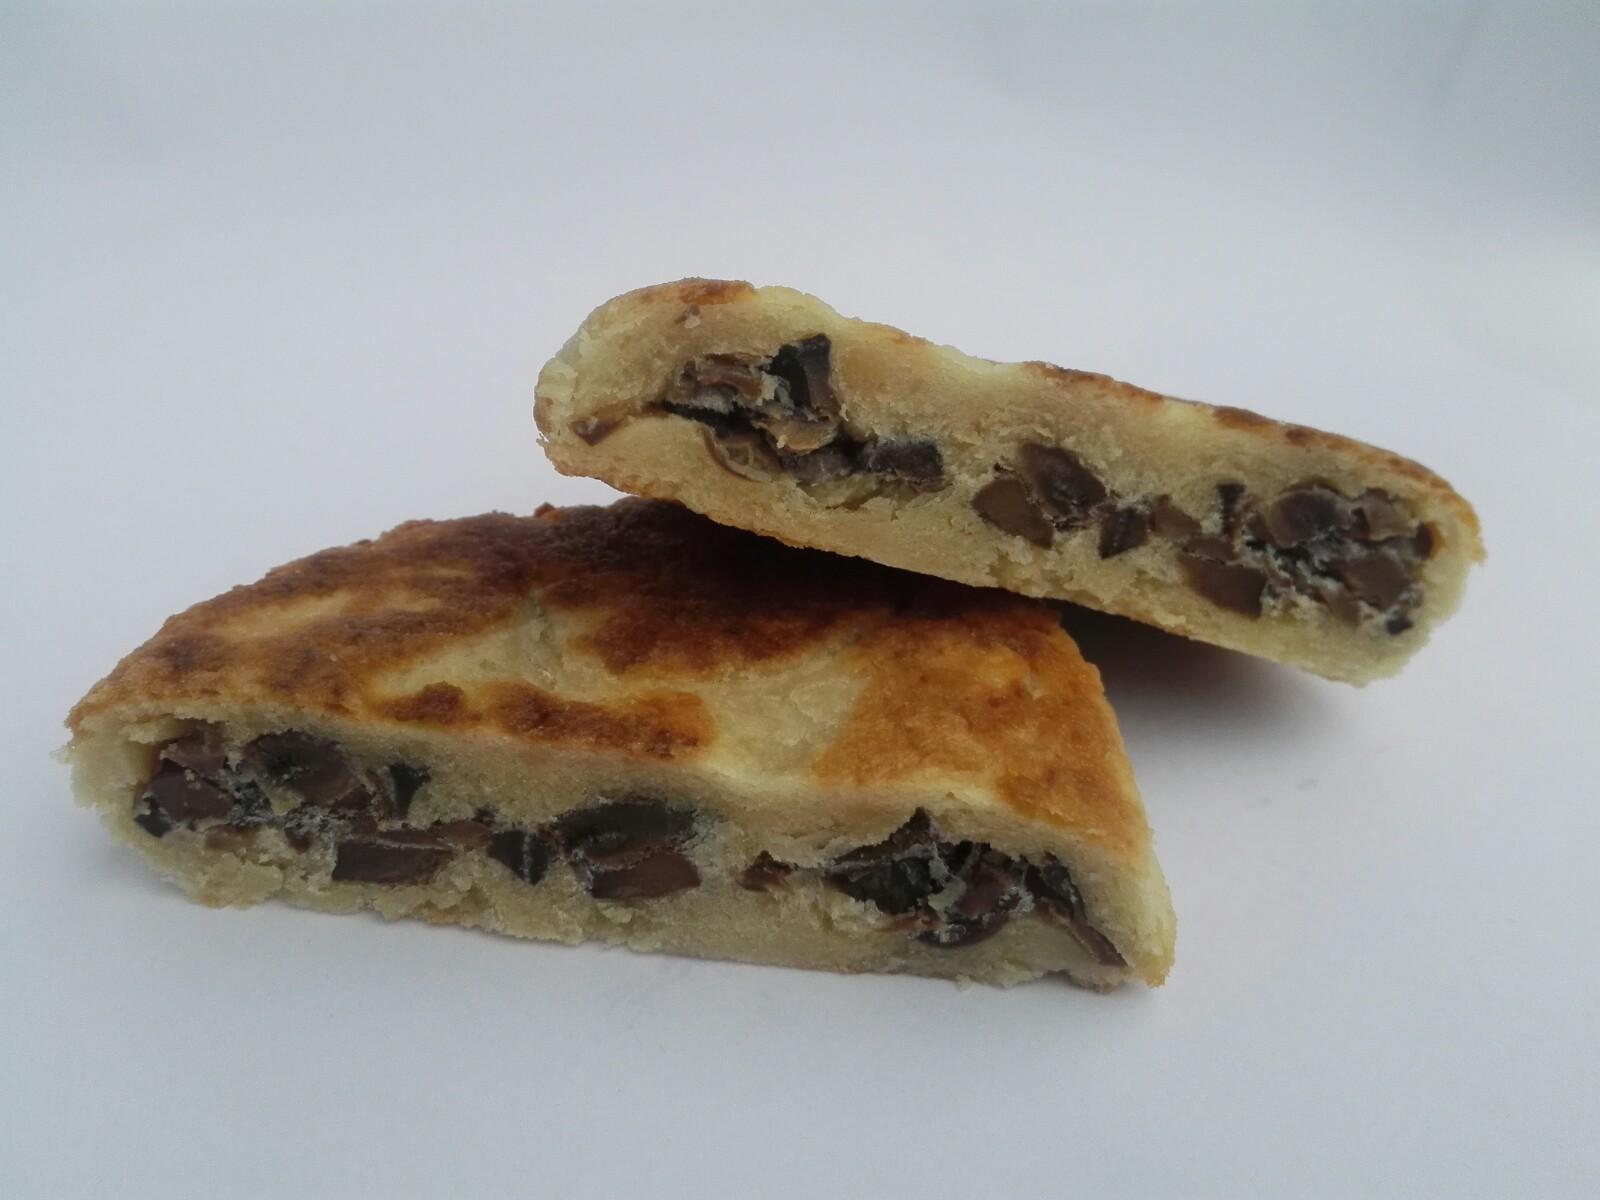 mushroom_potato_cake_russian_pies_1.jpg